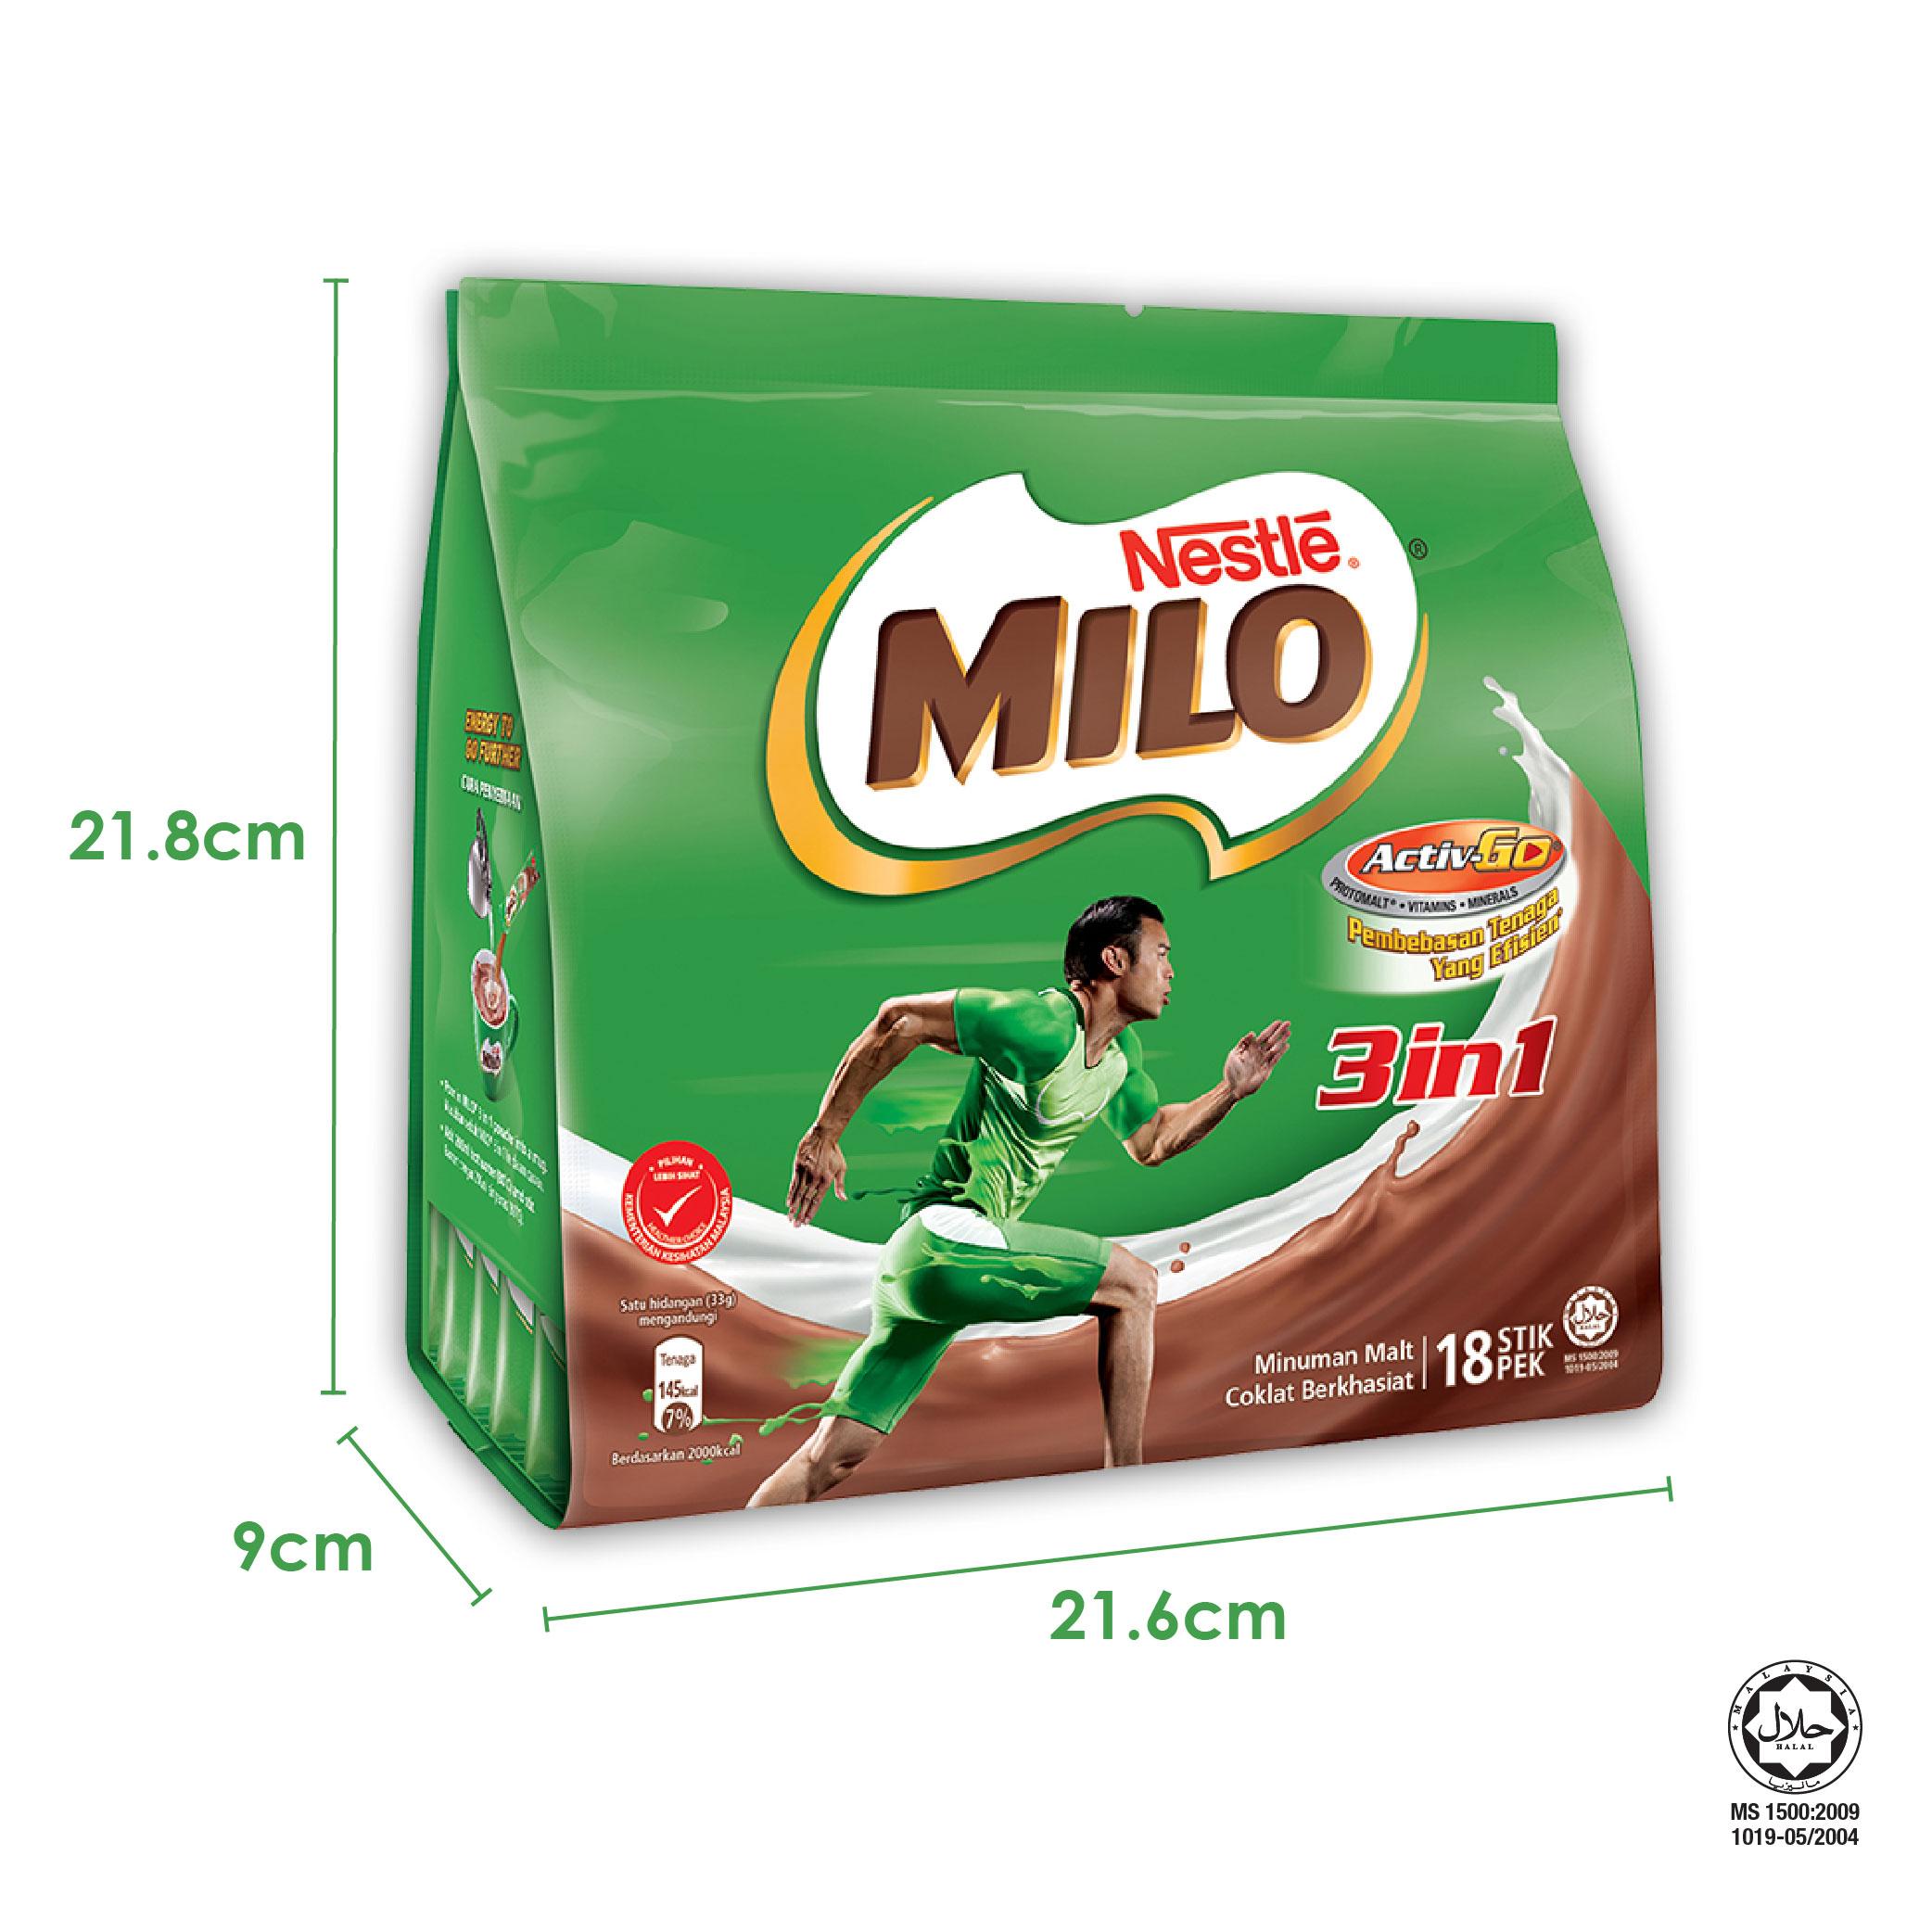 NESTLE MILO 3IN1 ACTIV-GO 18 Sticks 33g Free 3 sachets 30g Plus Fibre